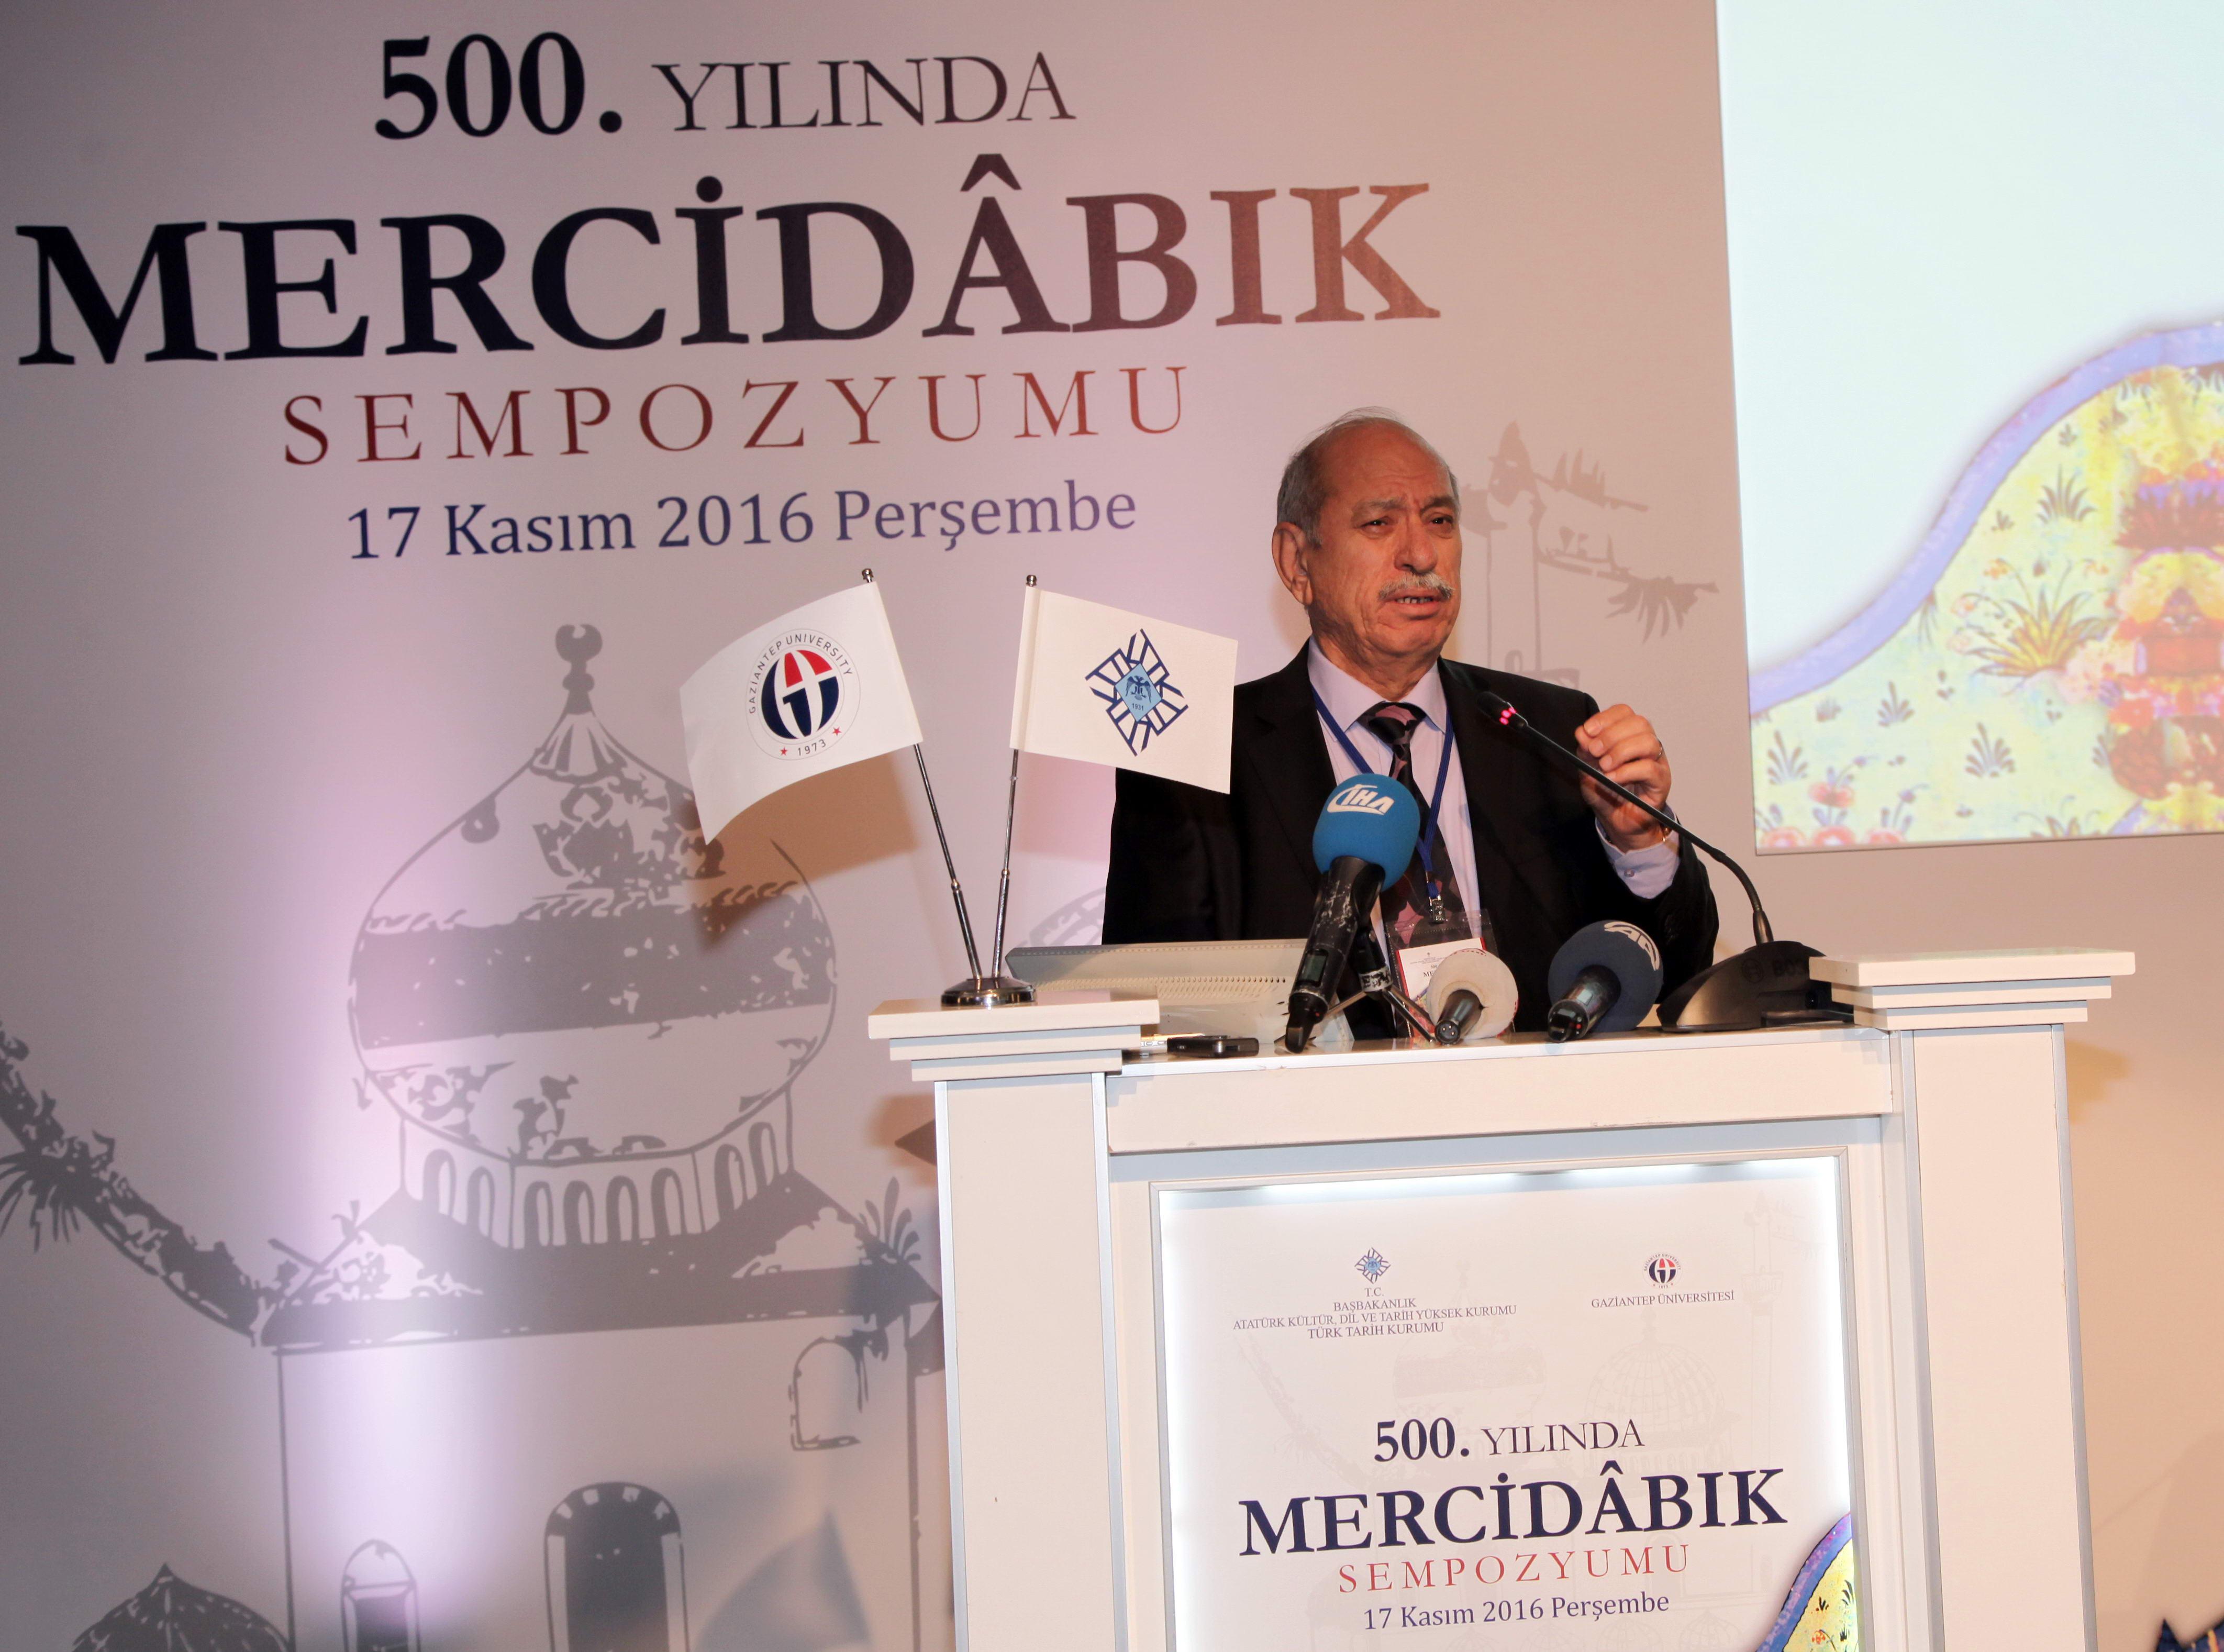 Mercidâbık Sempozyumu -  (Prof. Dr. Refik Turan)